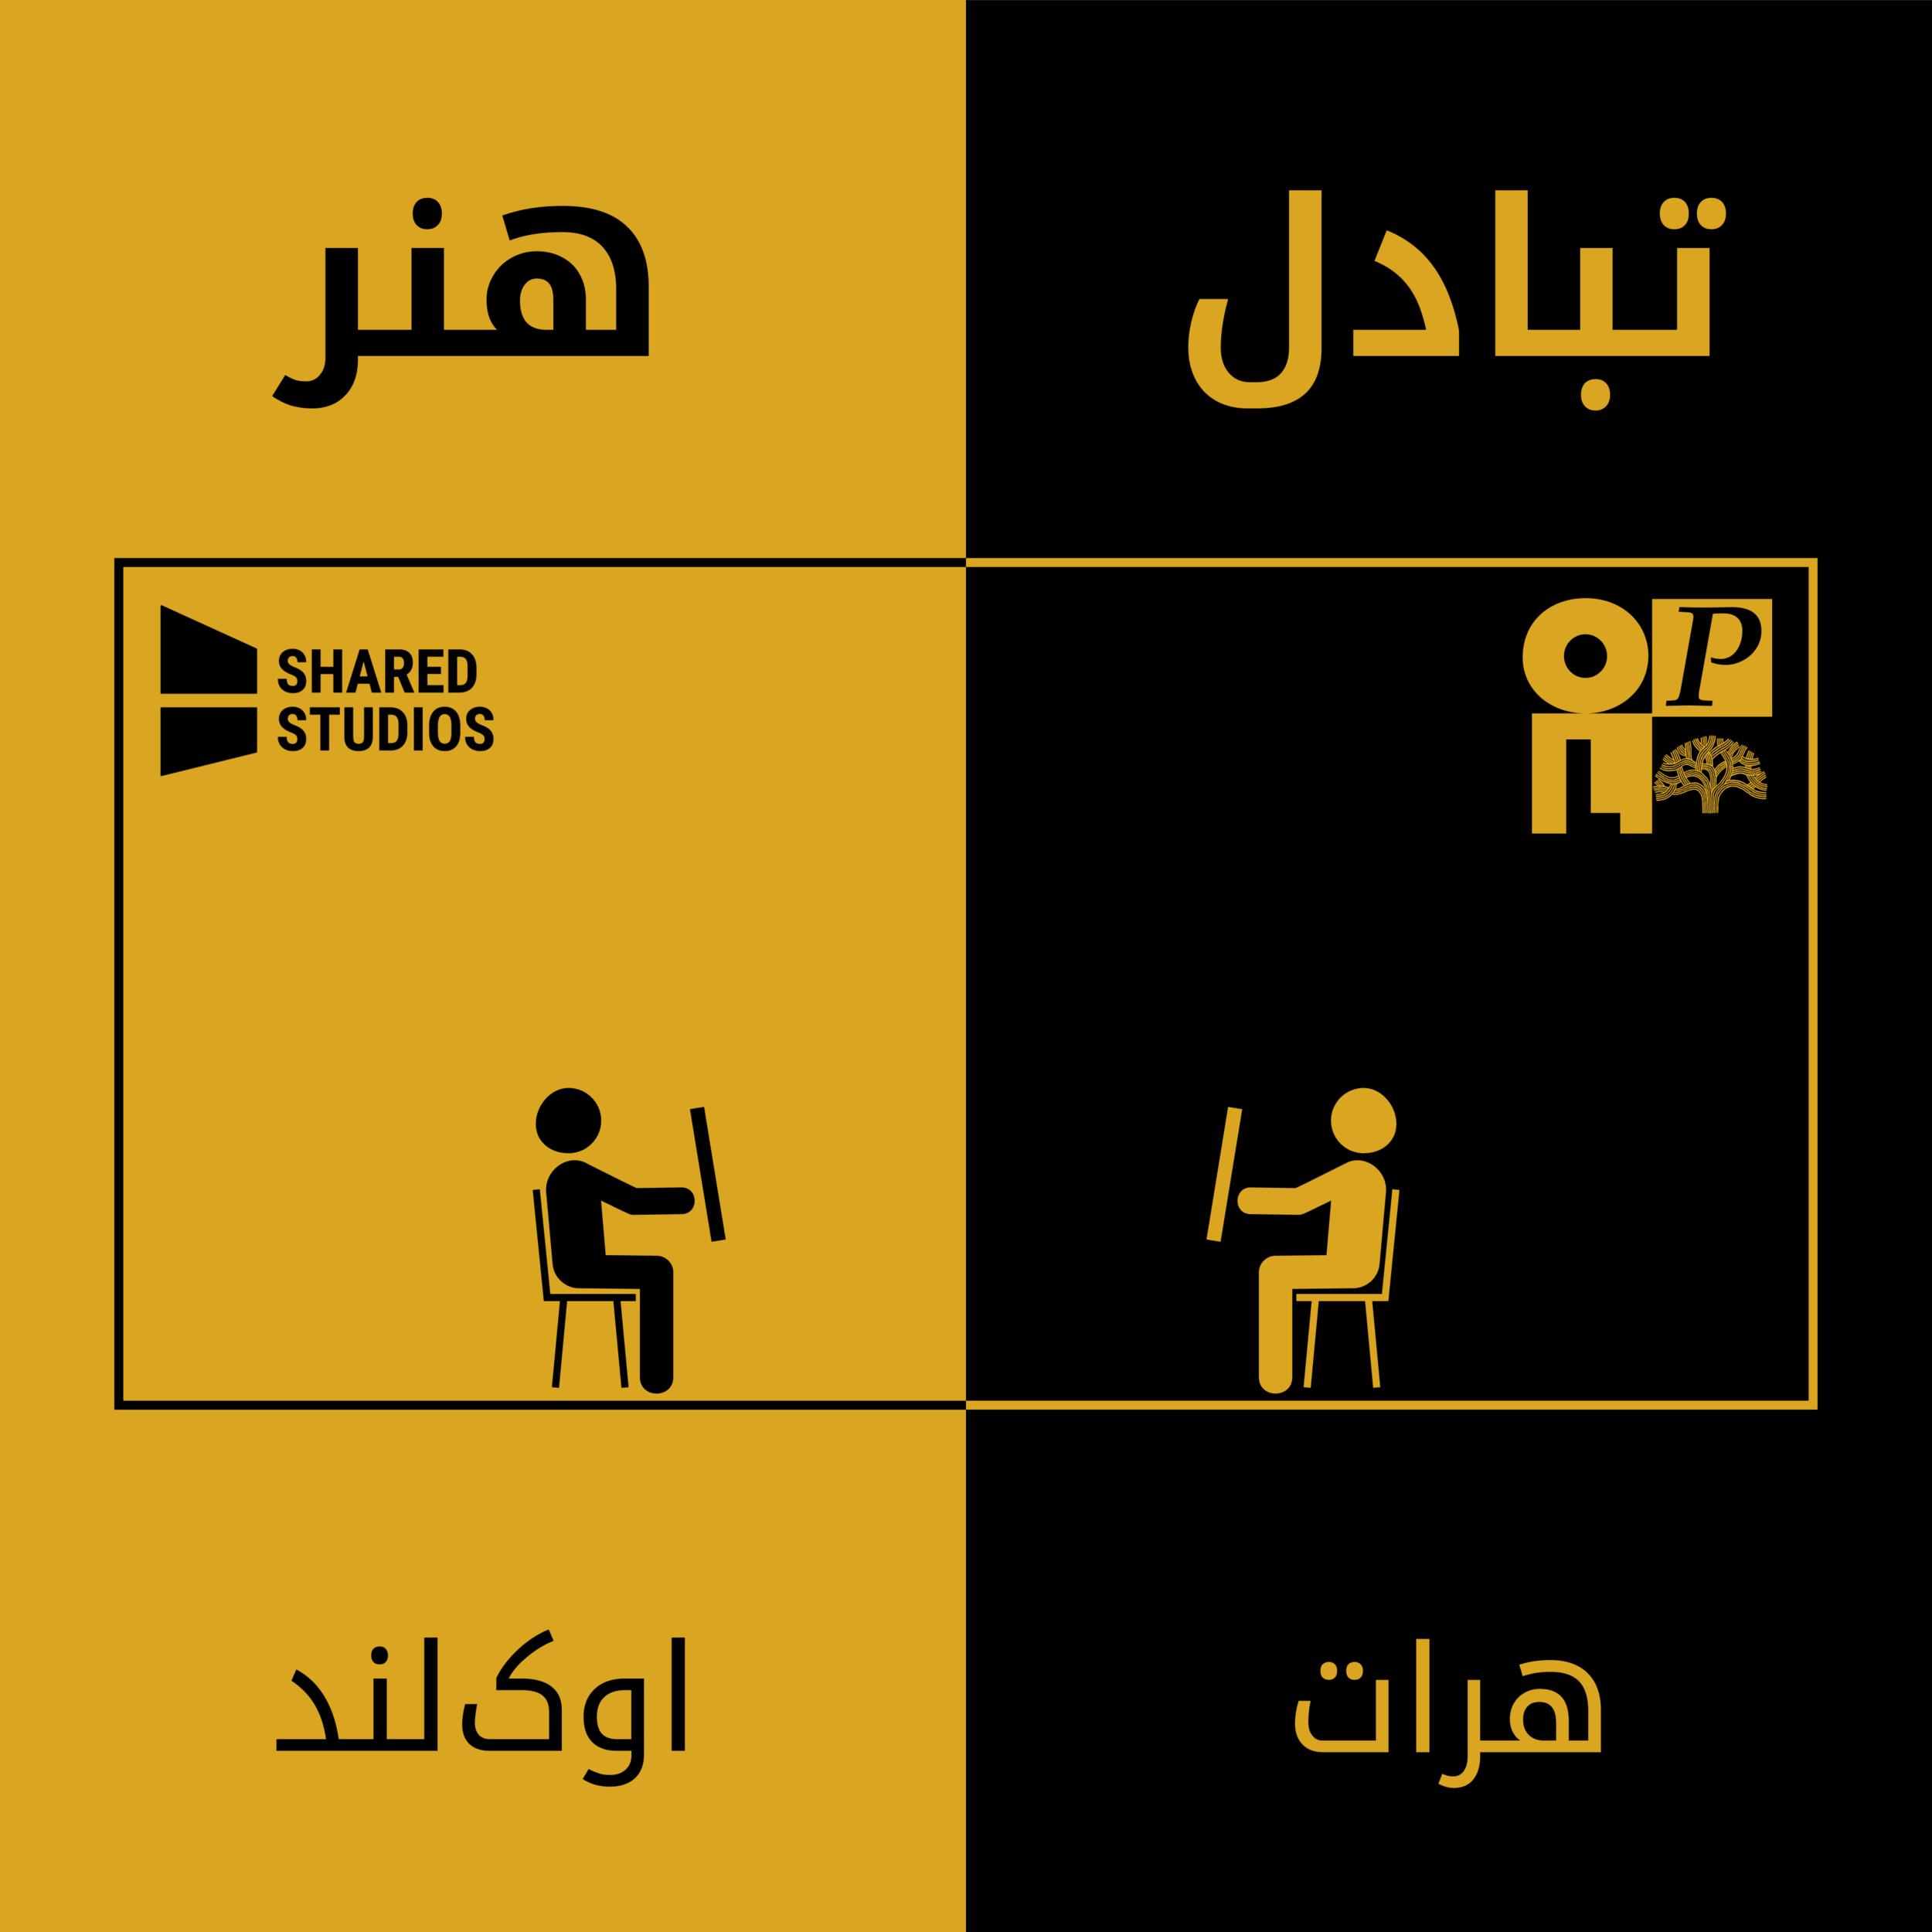 ArtExchange_Insta_Farsi_1.png